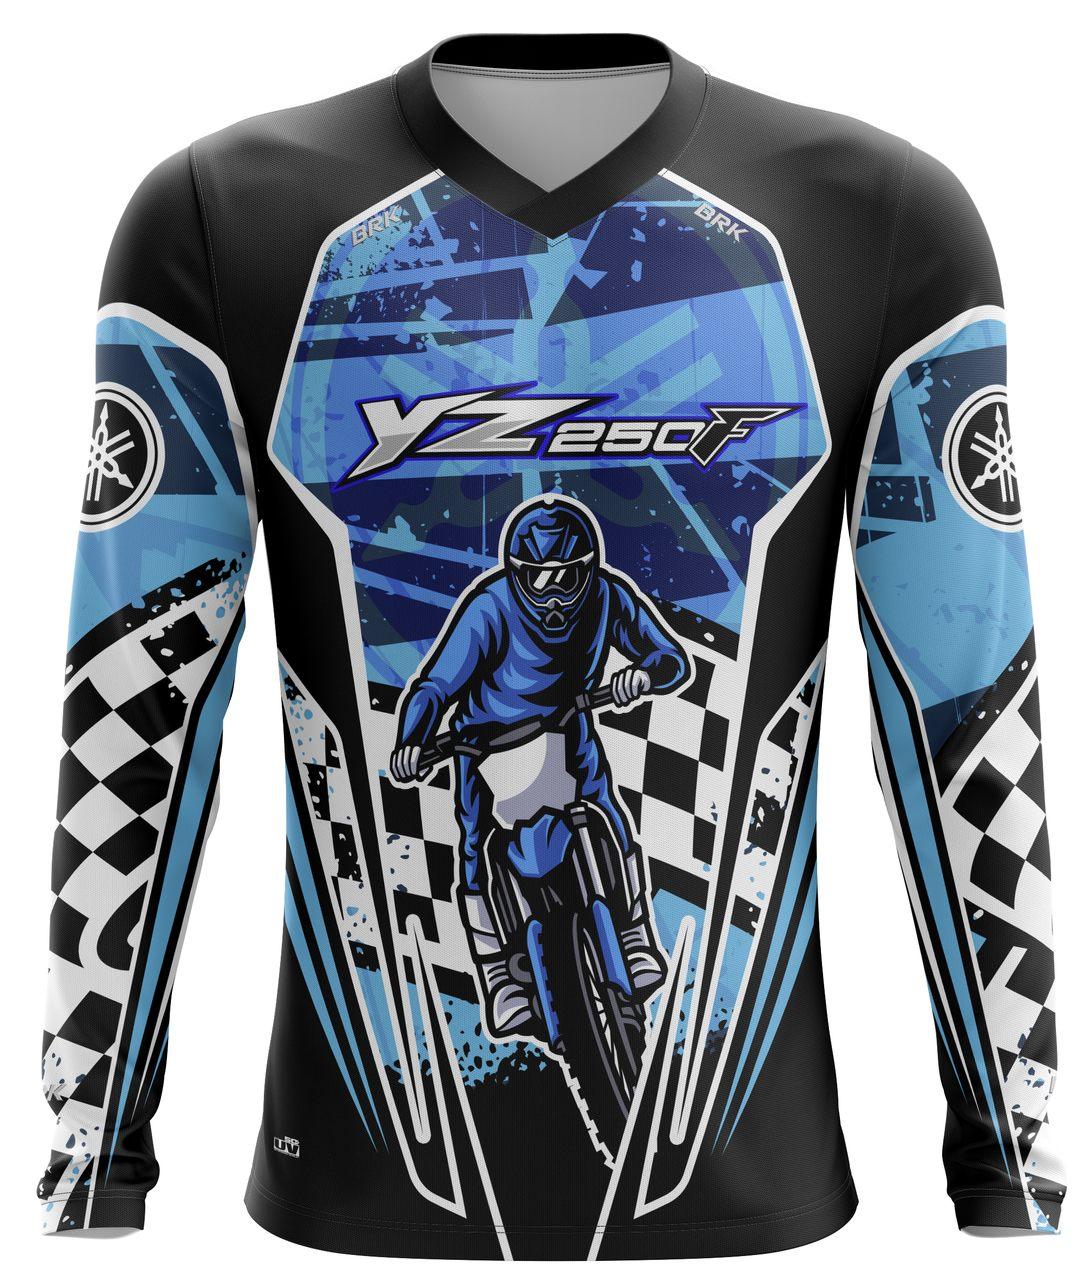 Camiseta Brk Motocross Yamaha YZ 250F com FPU 50+